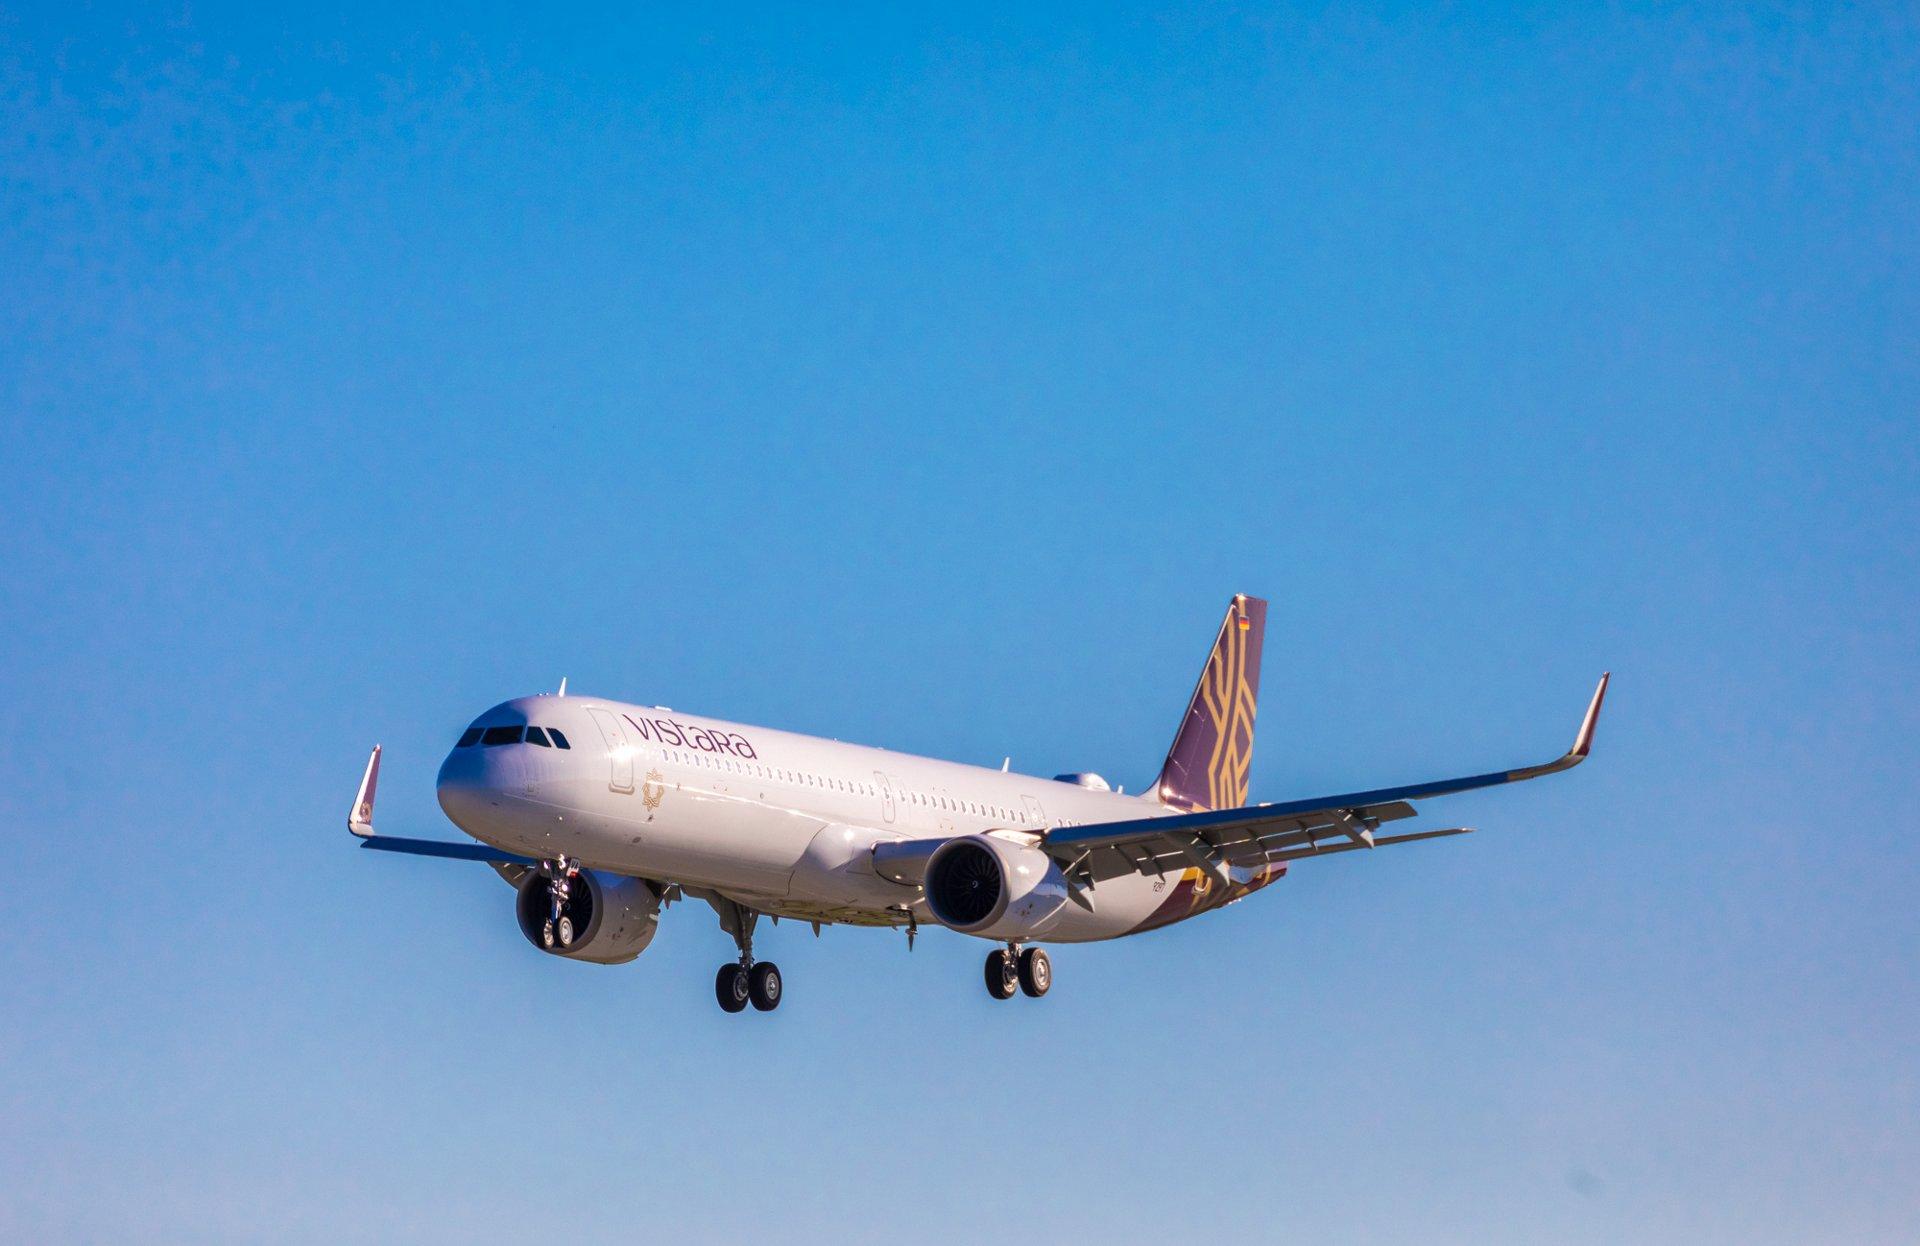 Vistara A321neo